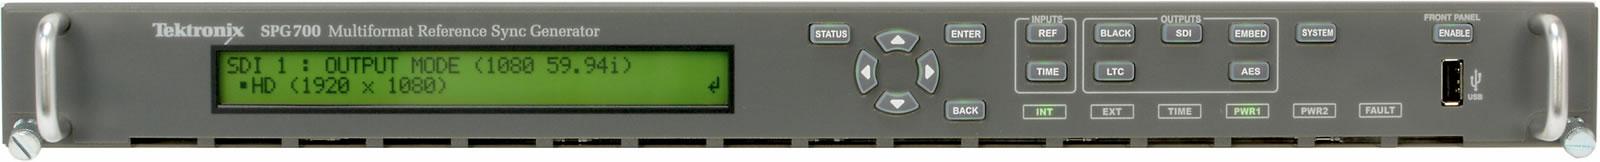 Video Test and Monitoring Equipment | Telestream